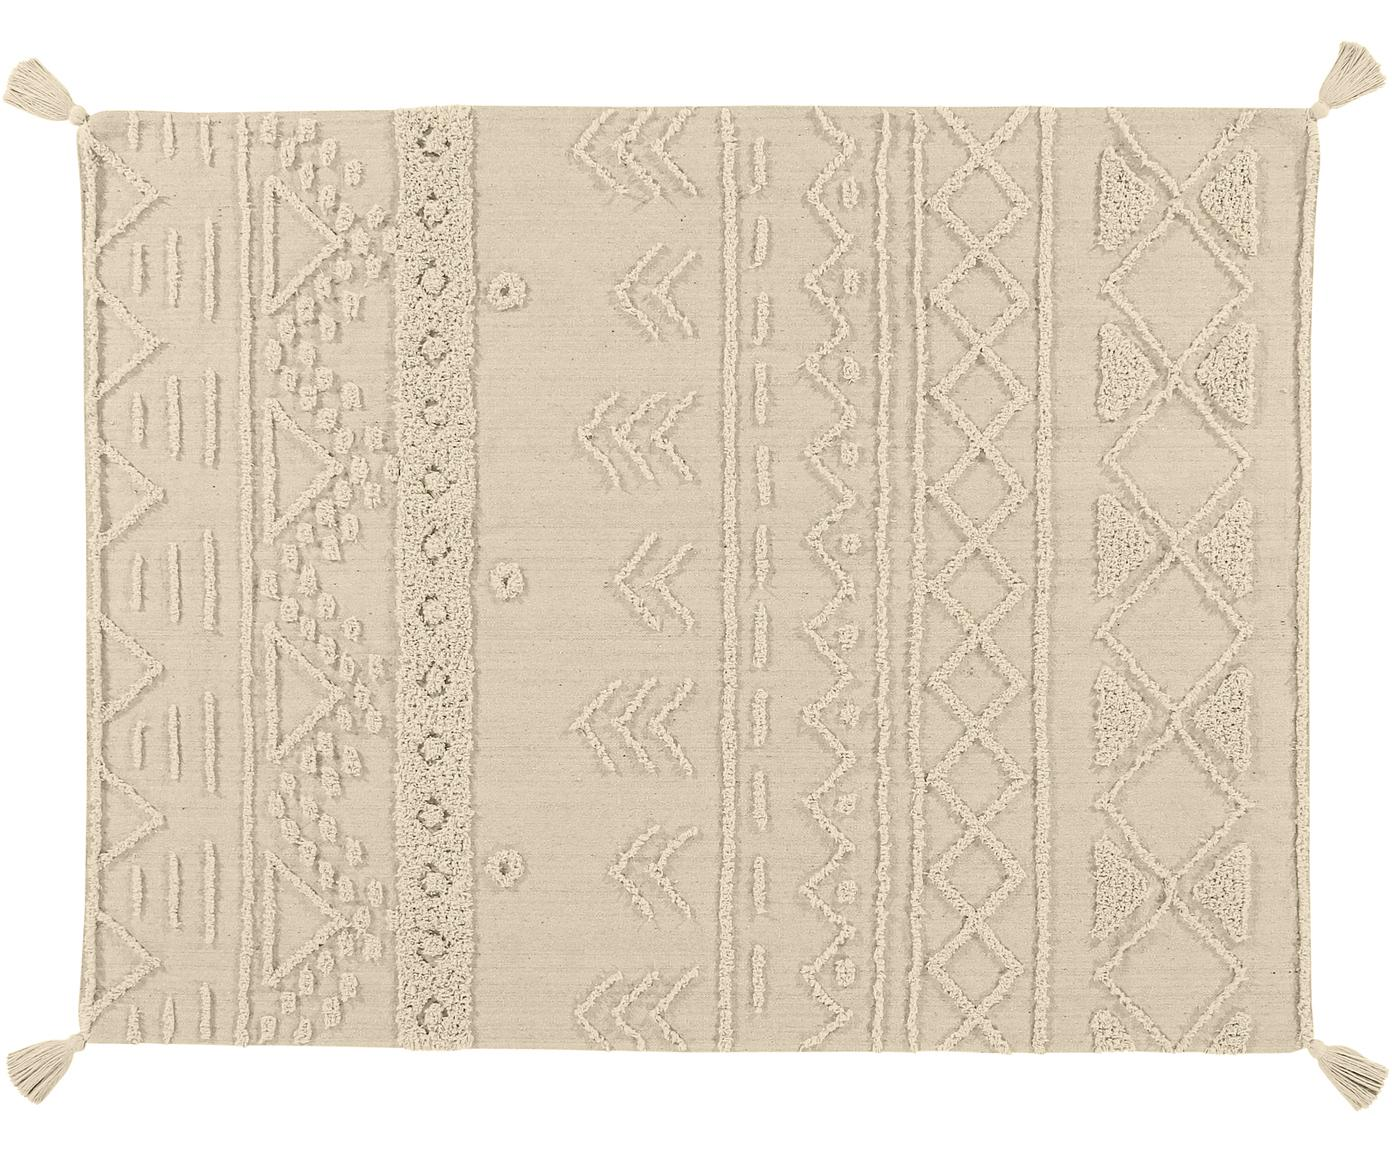 Ethno Teppich Tribu mit getuftetem Muster, Flor: 97% recycelte Baumwolle, , Grau, Beige, B 120 x L 160 cm (Größe S)